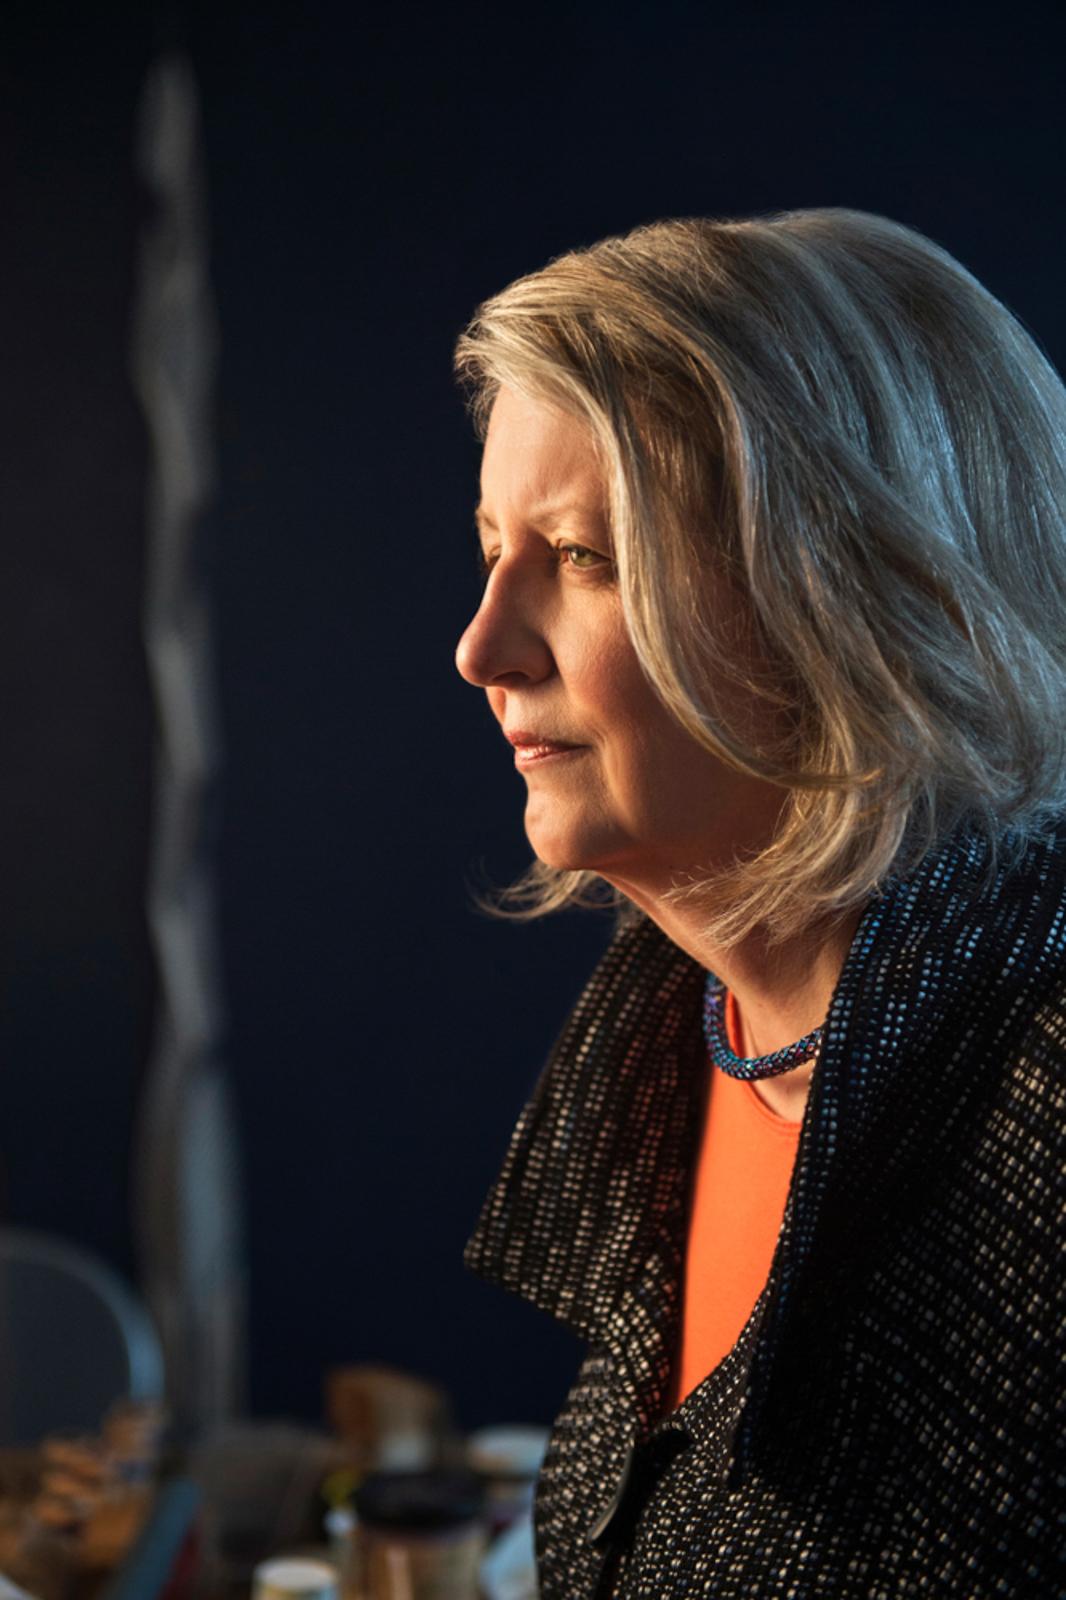 Side profile of older woman in a studio, looking pensive